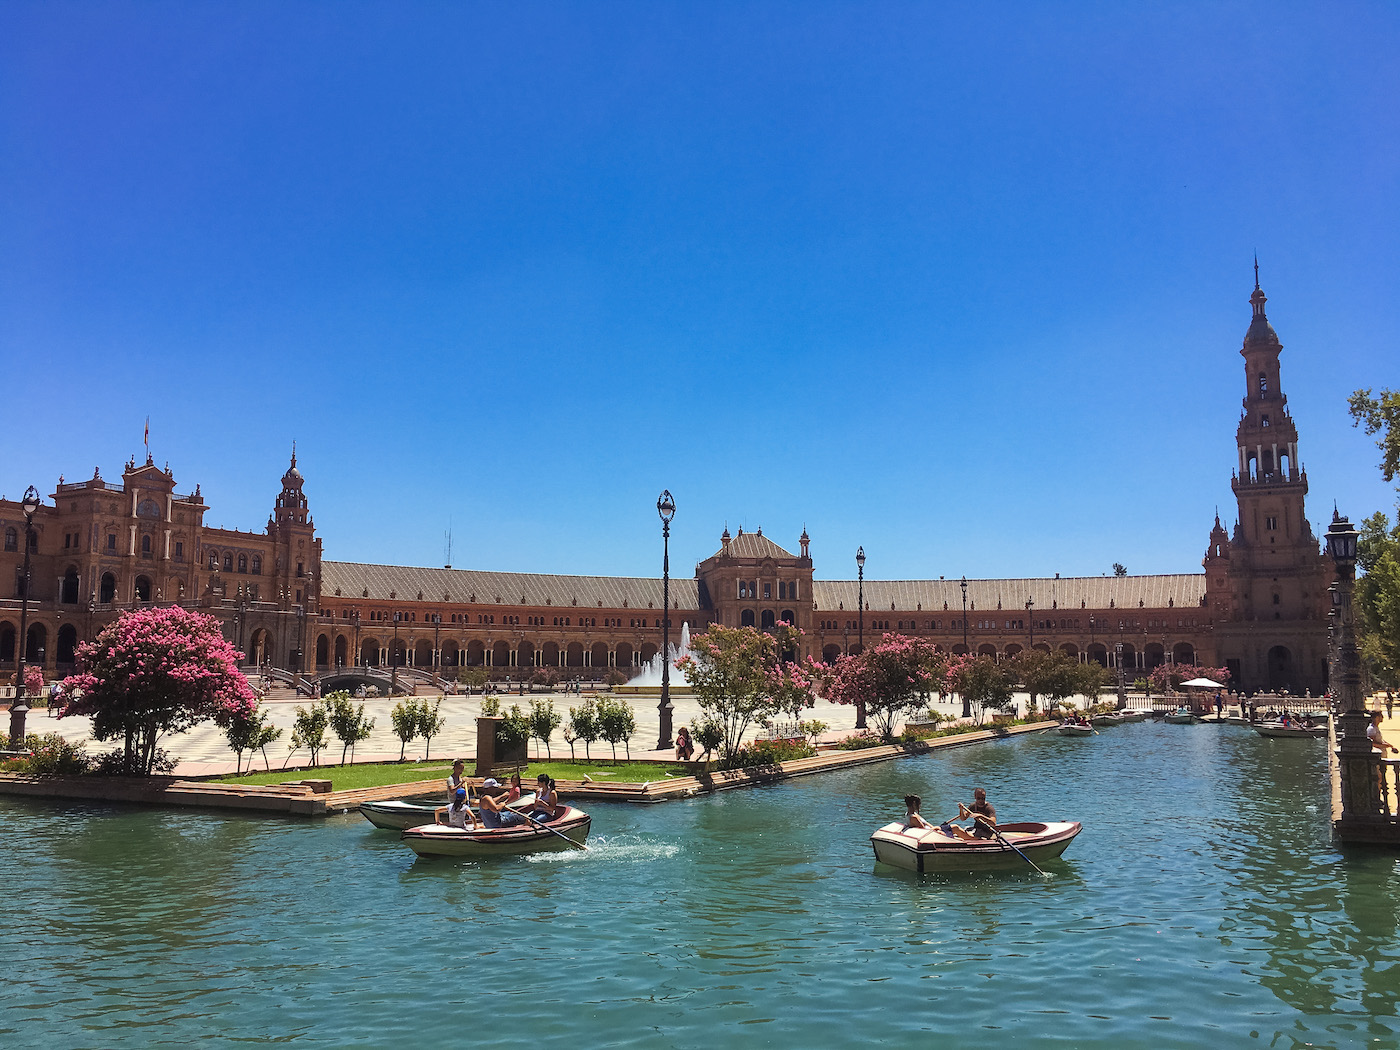 Mooiste steden andalusie vakantie